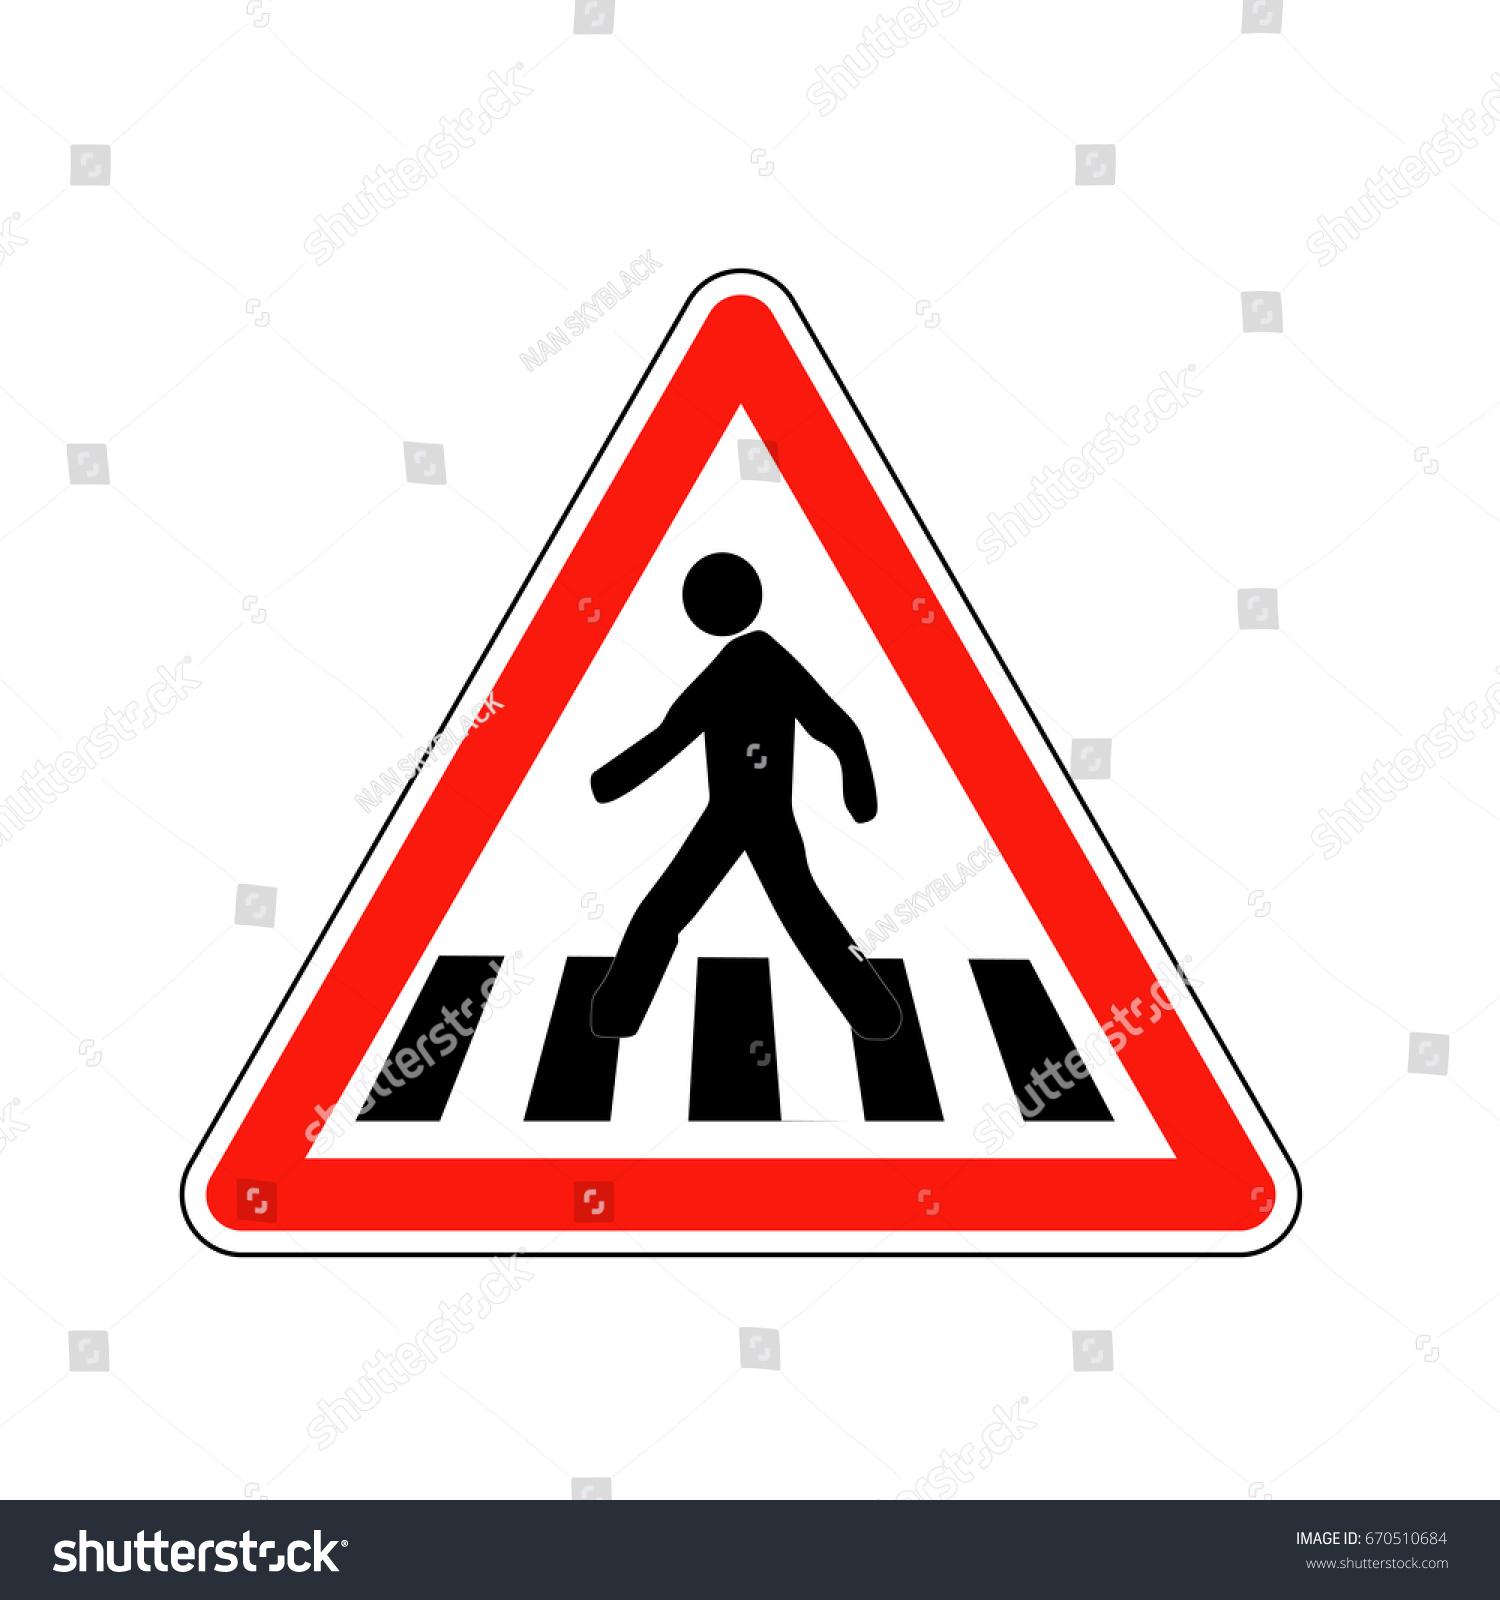 france pedestrian crossing sign のベクター画像素材 ロイヤリティ